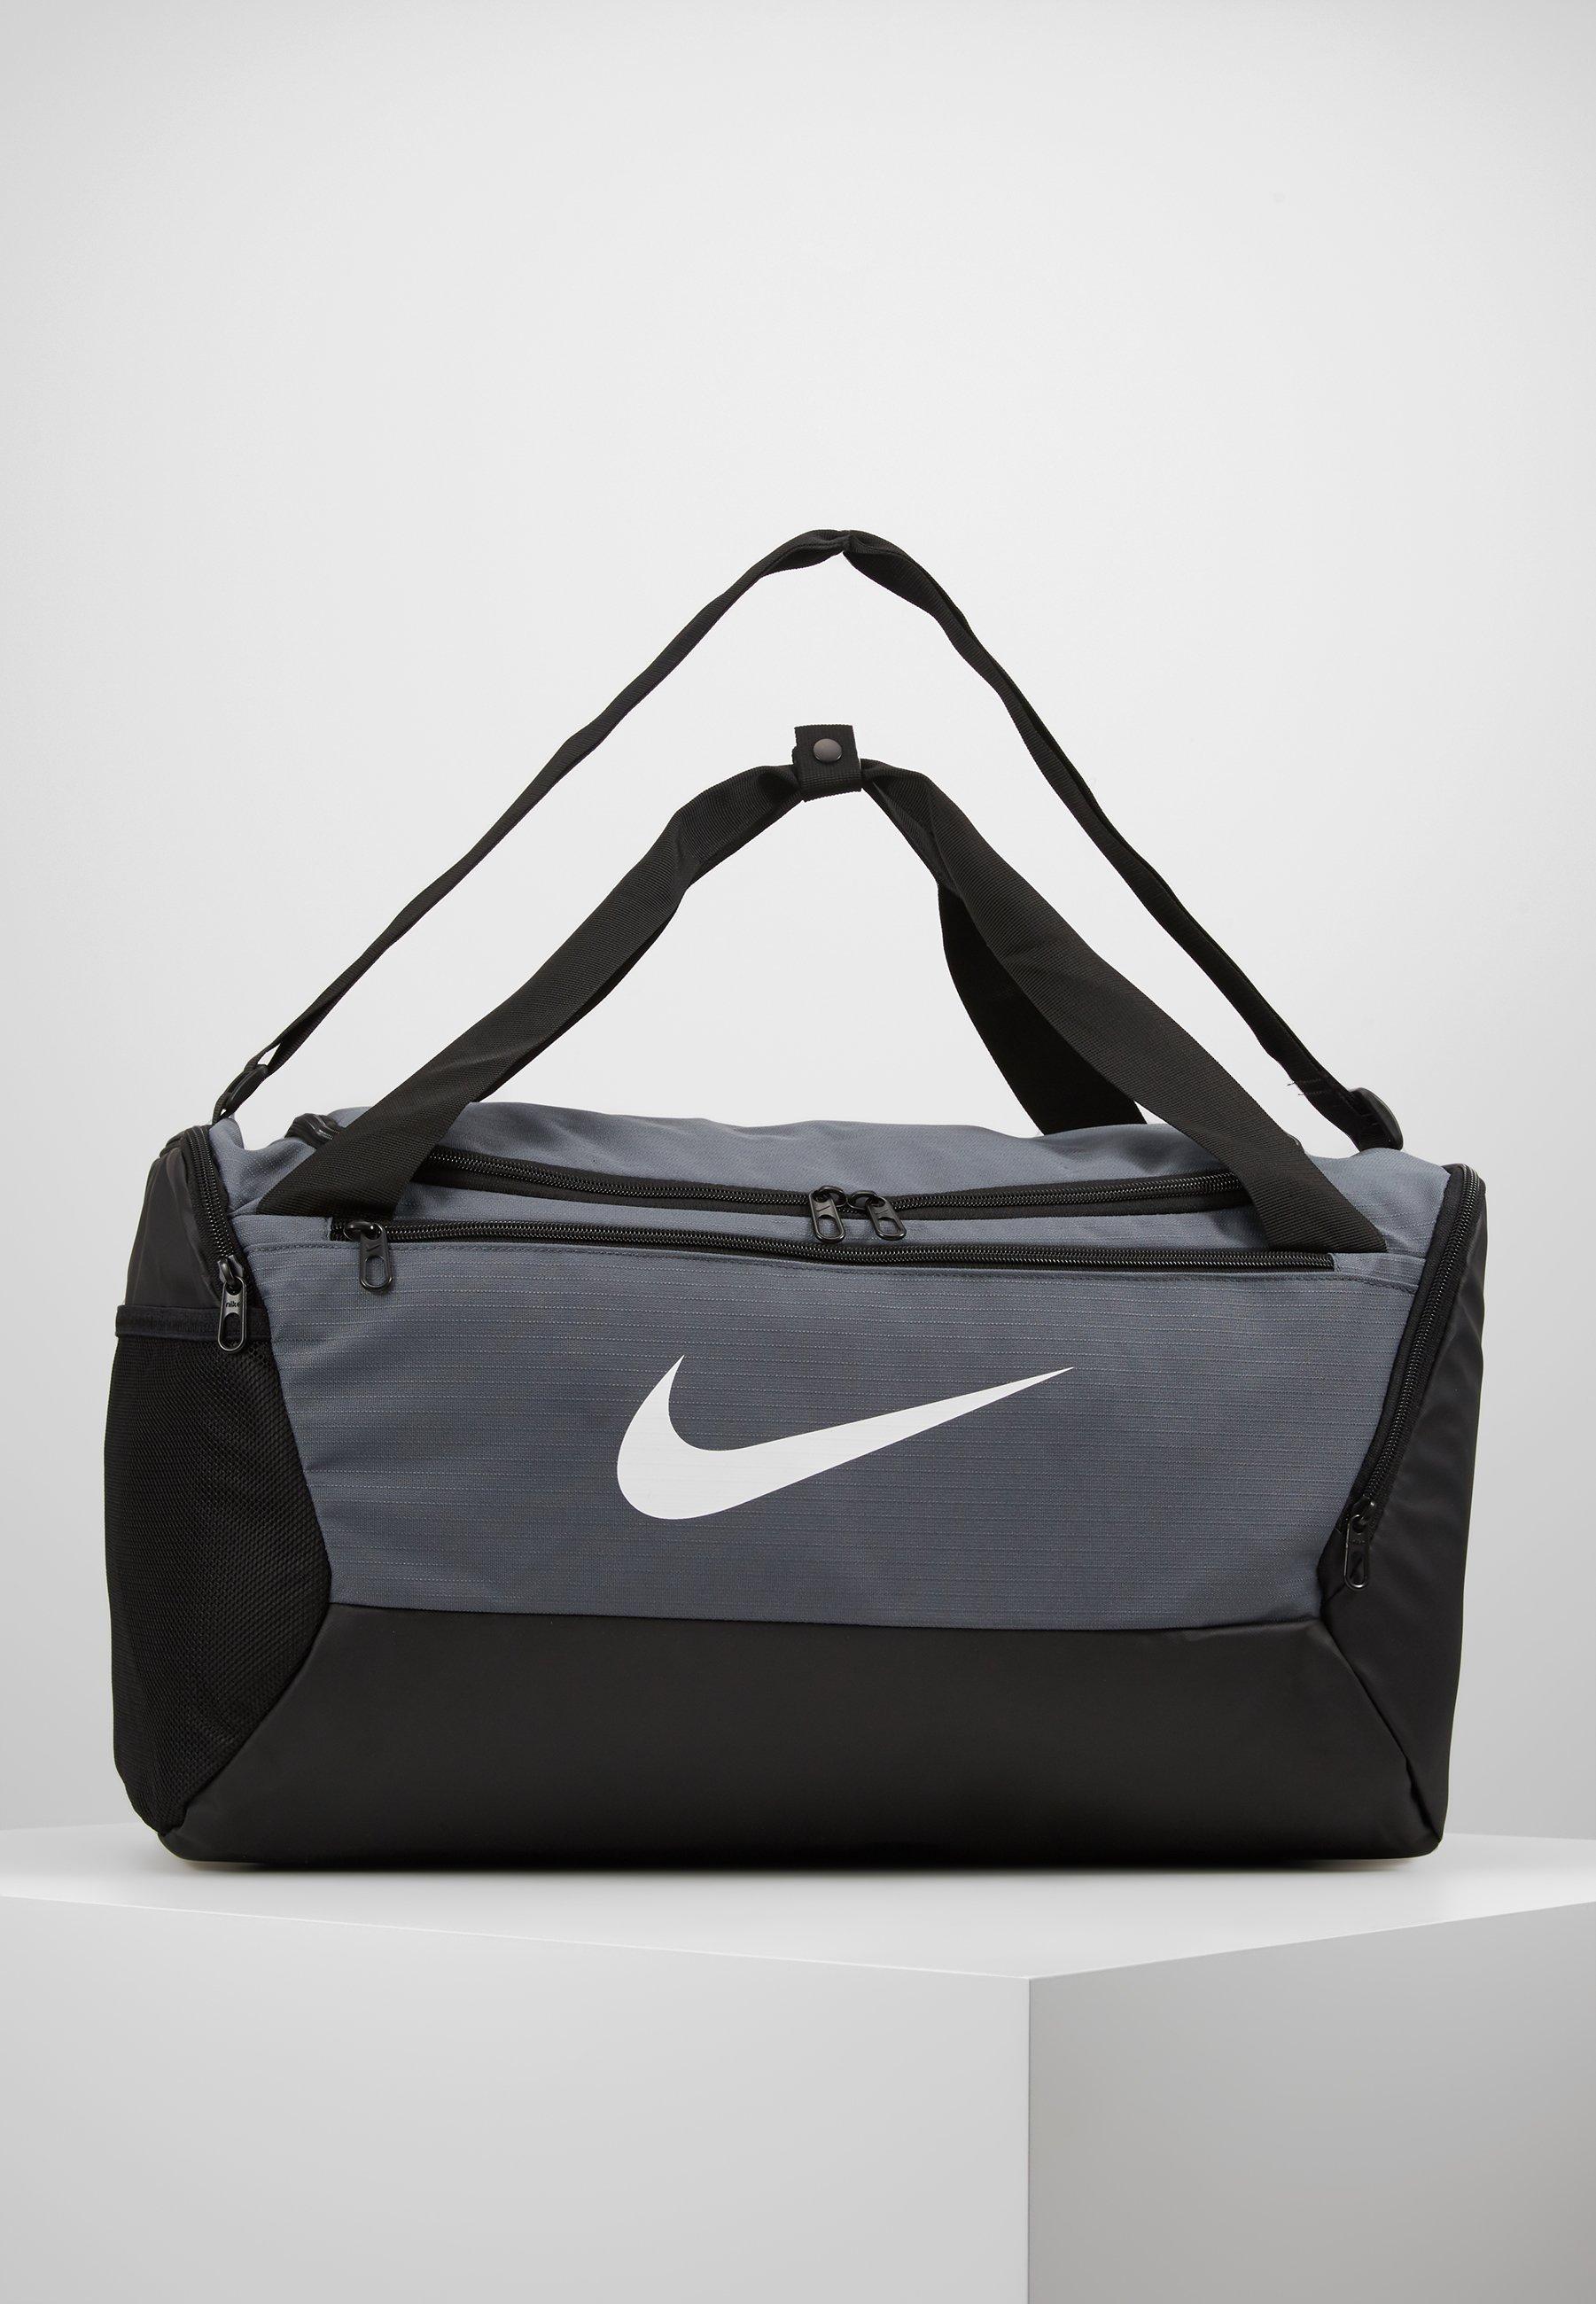 Damen DUFF 9.0 - Sporttasche